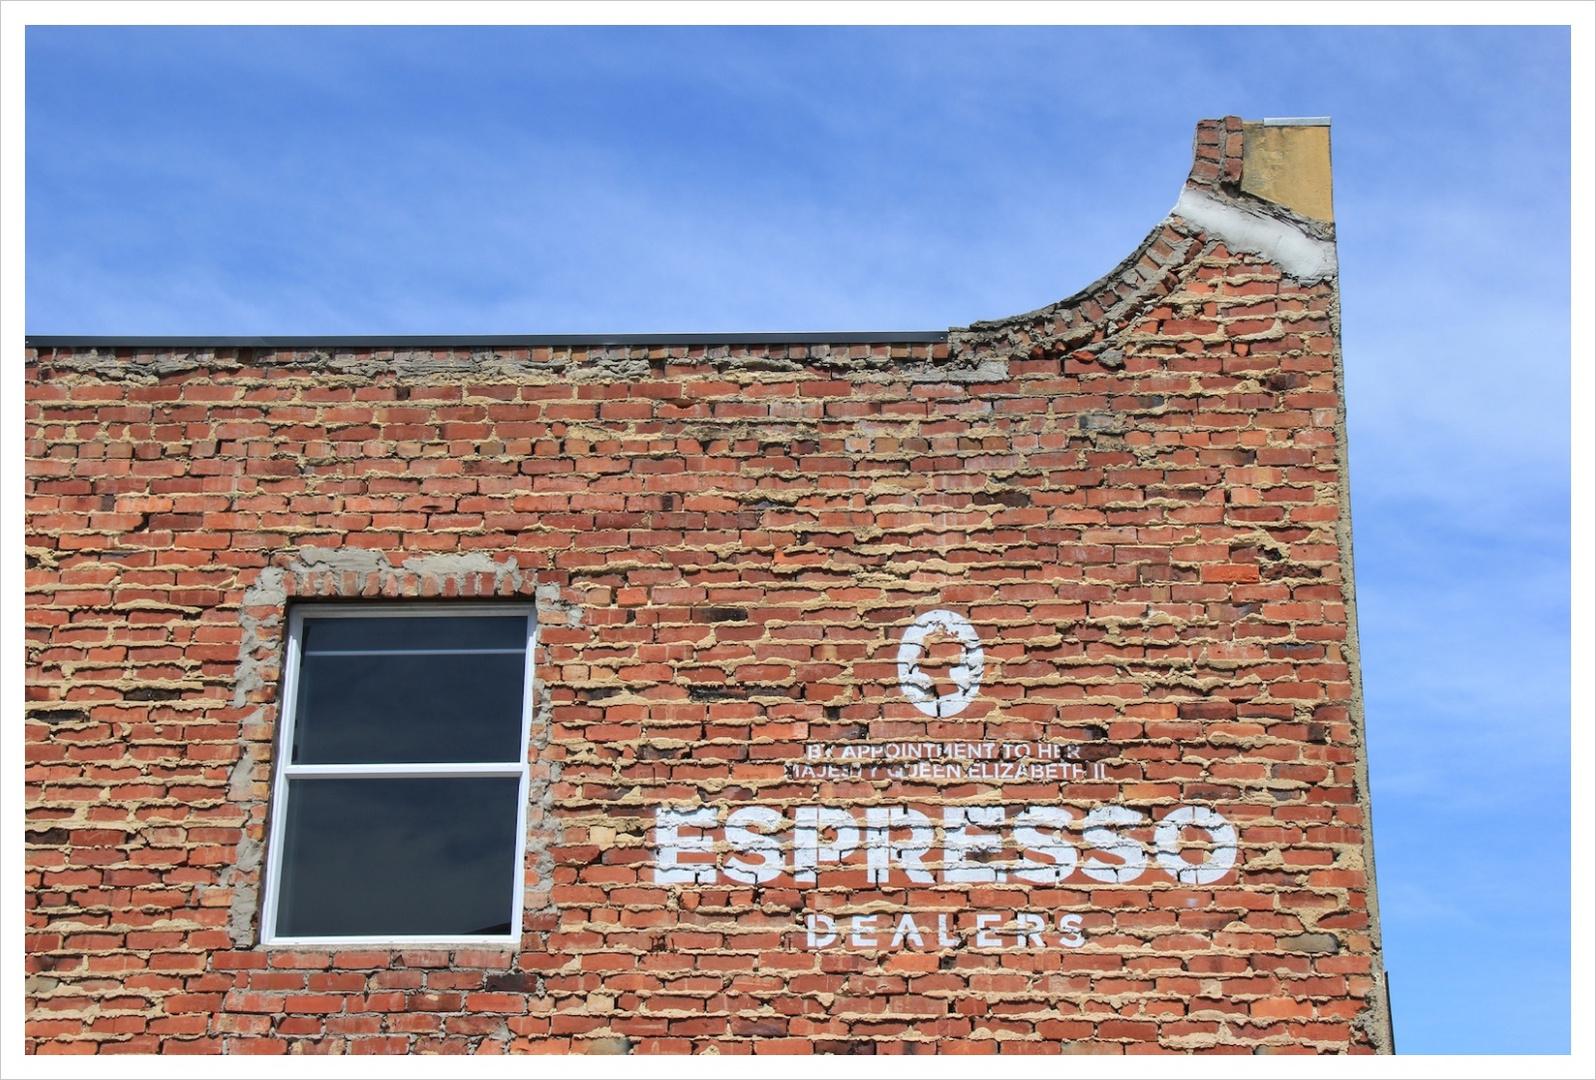 Dunedin Coffee